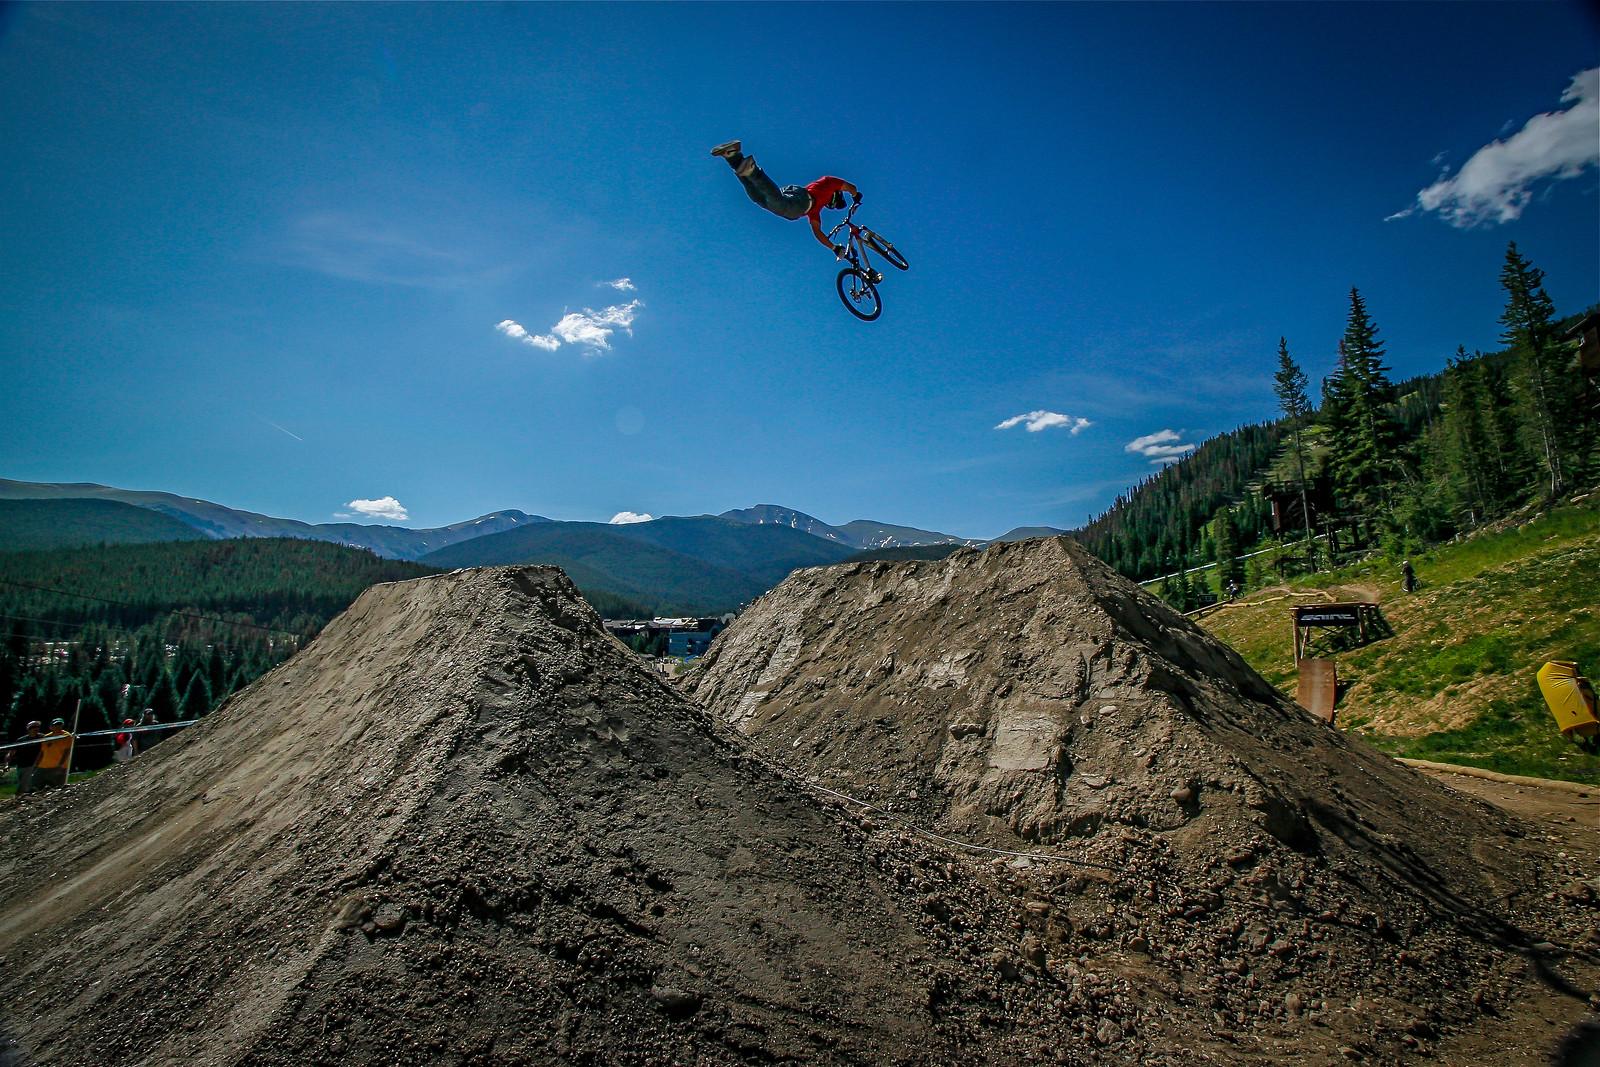 Jamie Superman (1 of 1) - Malcolm Mclaws - Mountain Biking Pictures - Vital MTB